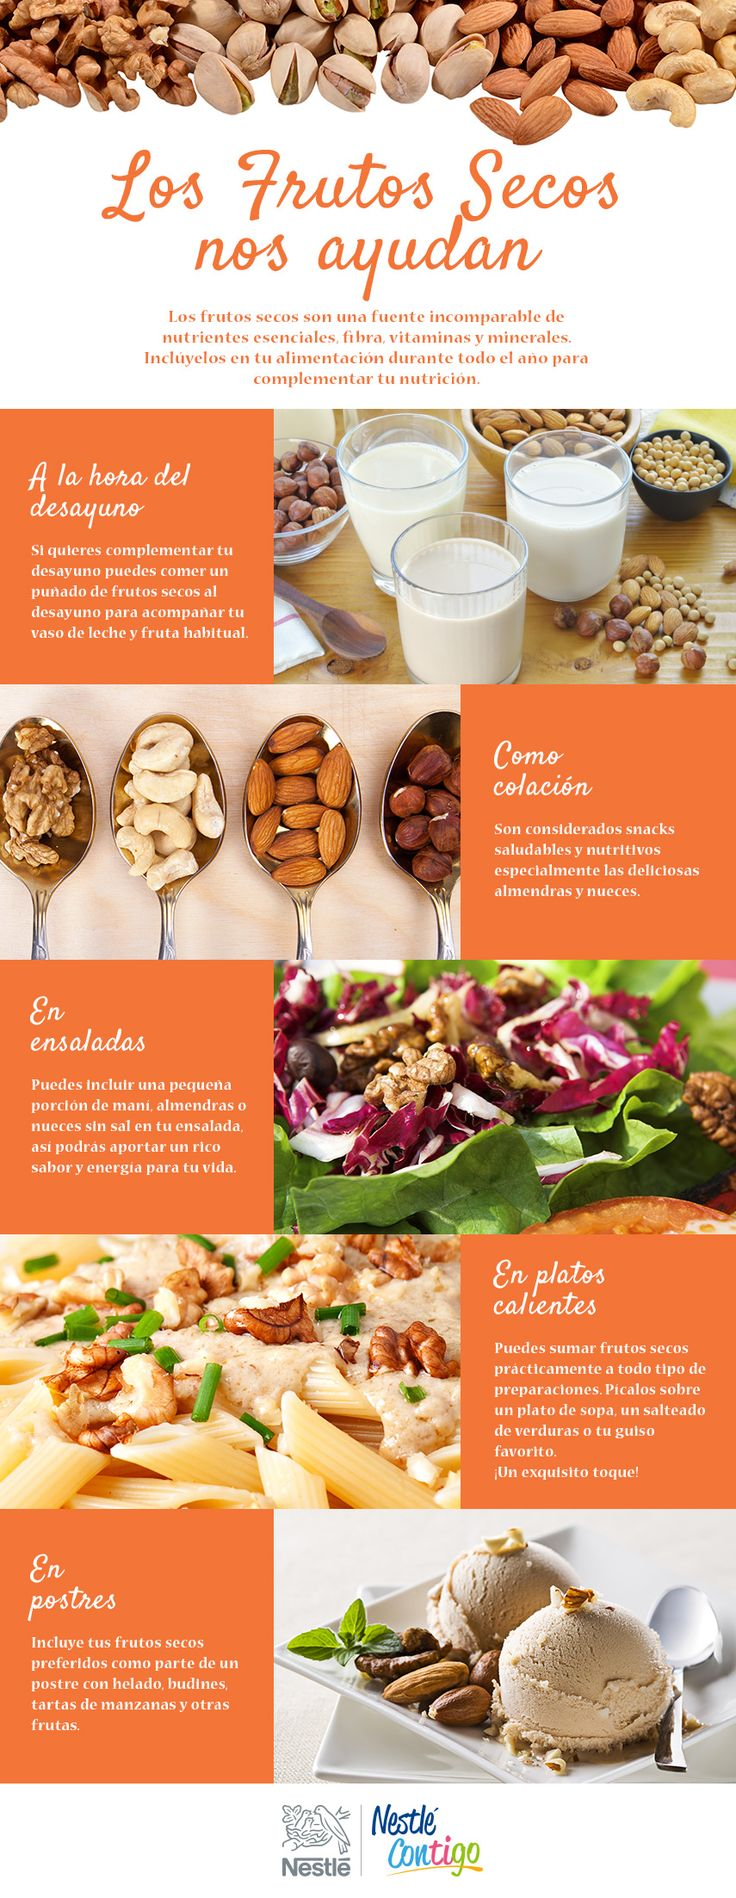 Los Frutos Secos nos ayudan   Mas nutricion   Nestlé Contigo